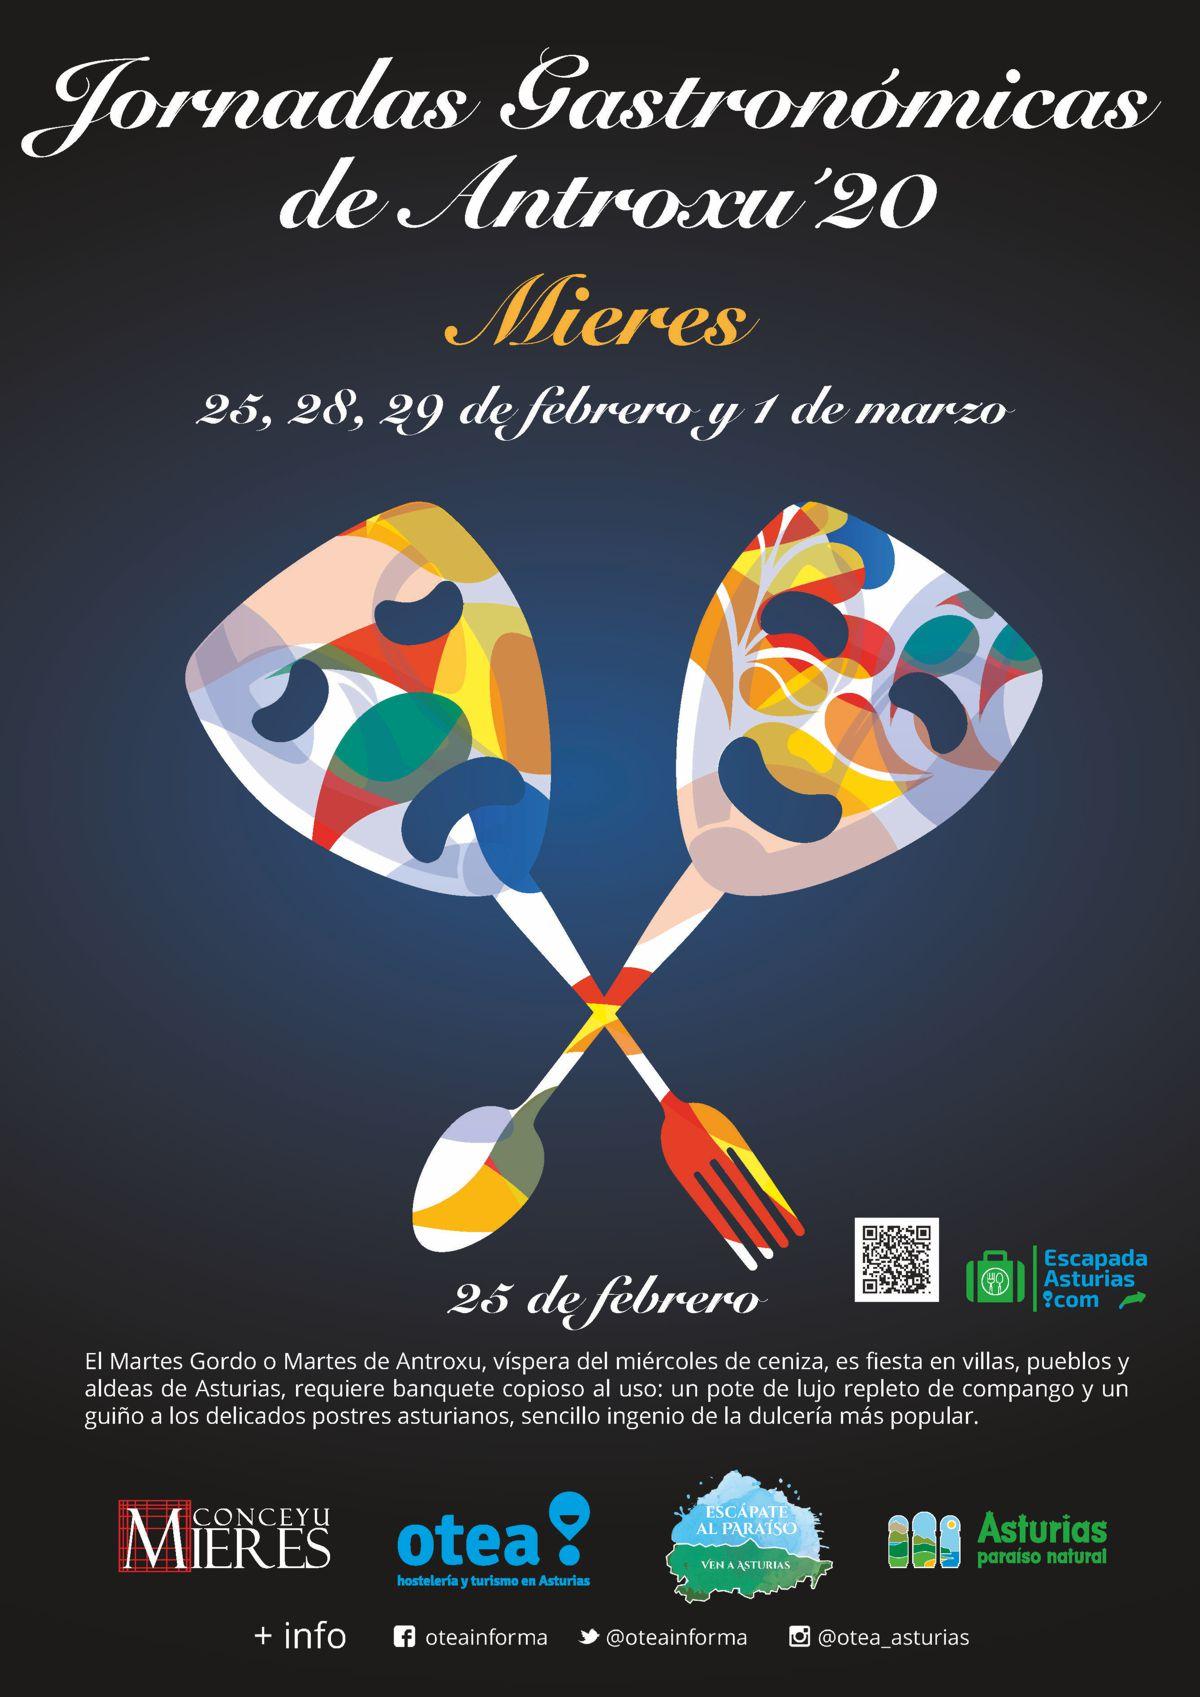 Cartel Web Jornadas Gastronomicas Antroxu 2020